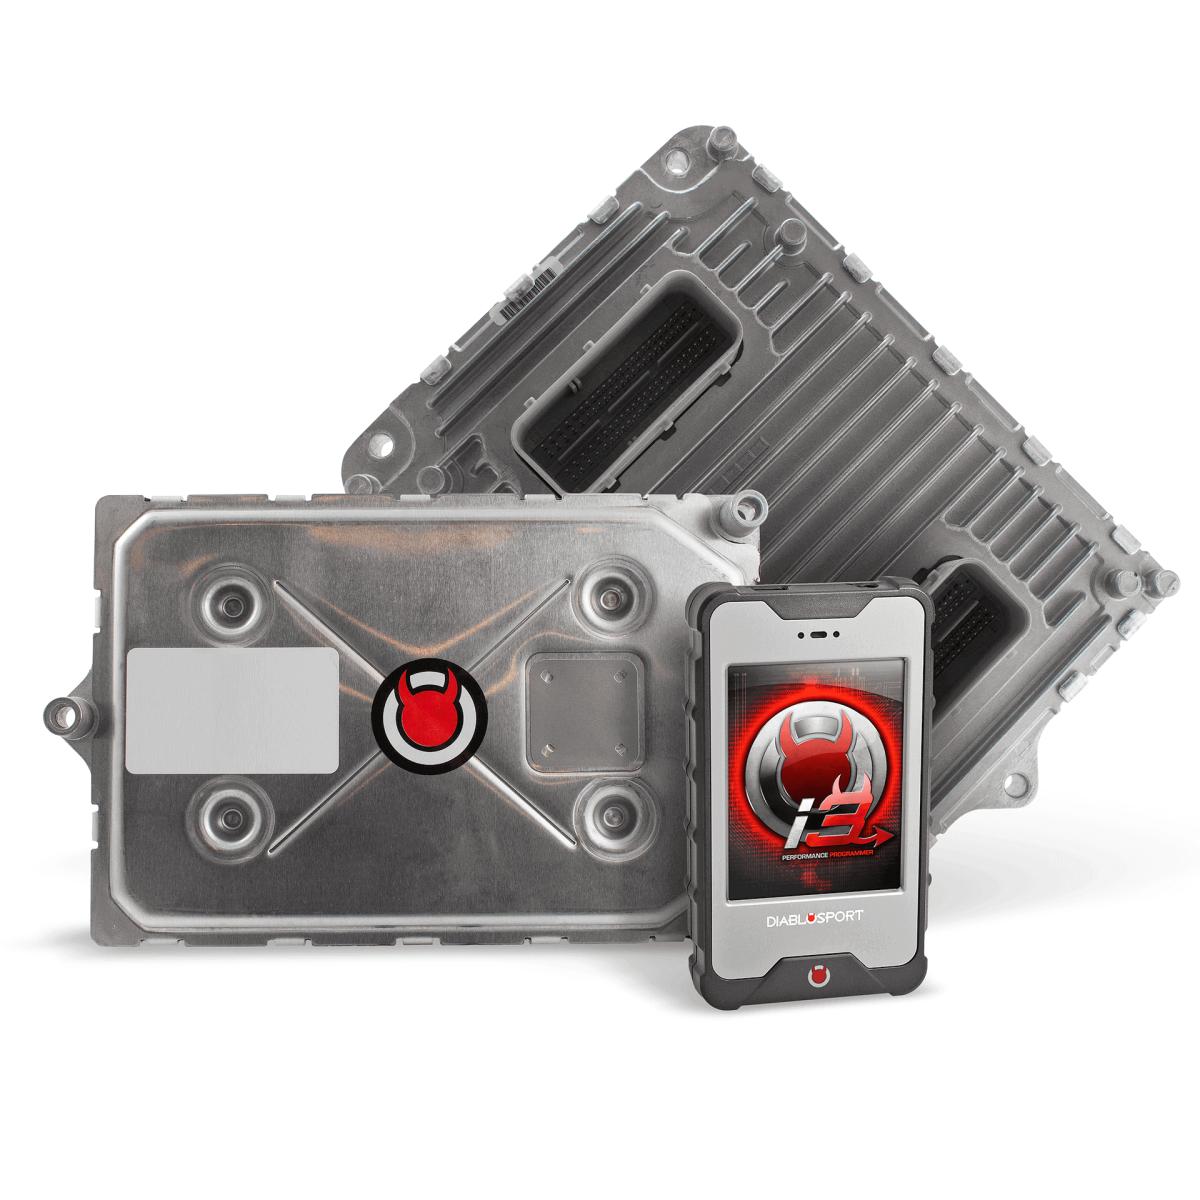 DiabloSport - DiabloSport Modified PCM & inTune i3 Tuning Combo For 2019 Jeep Grand Cherokee Trakhawk 6.2L - Image 1